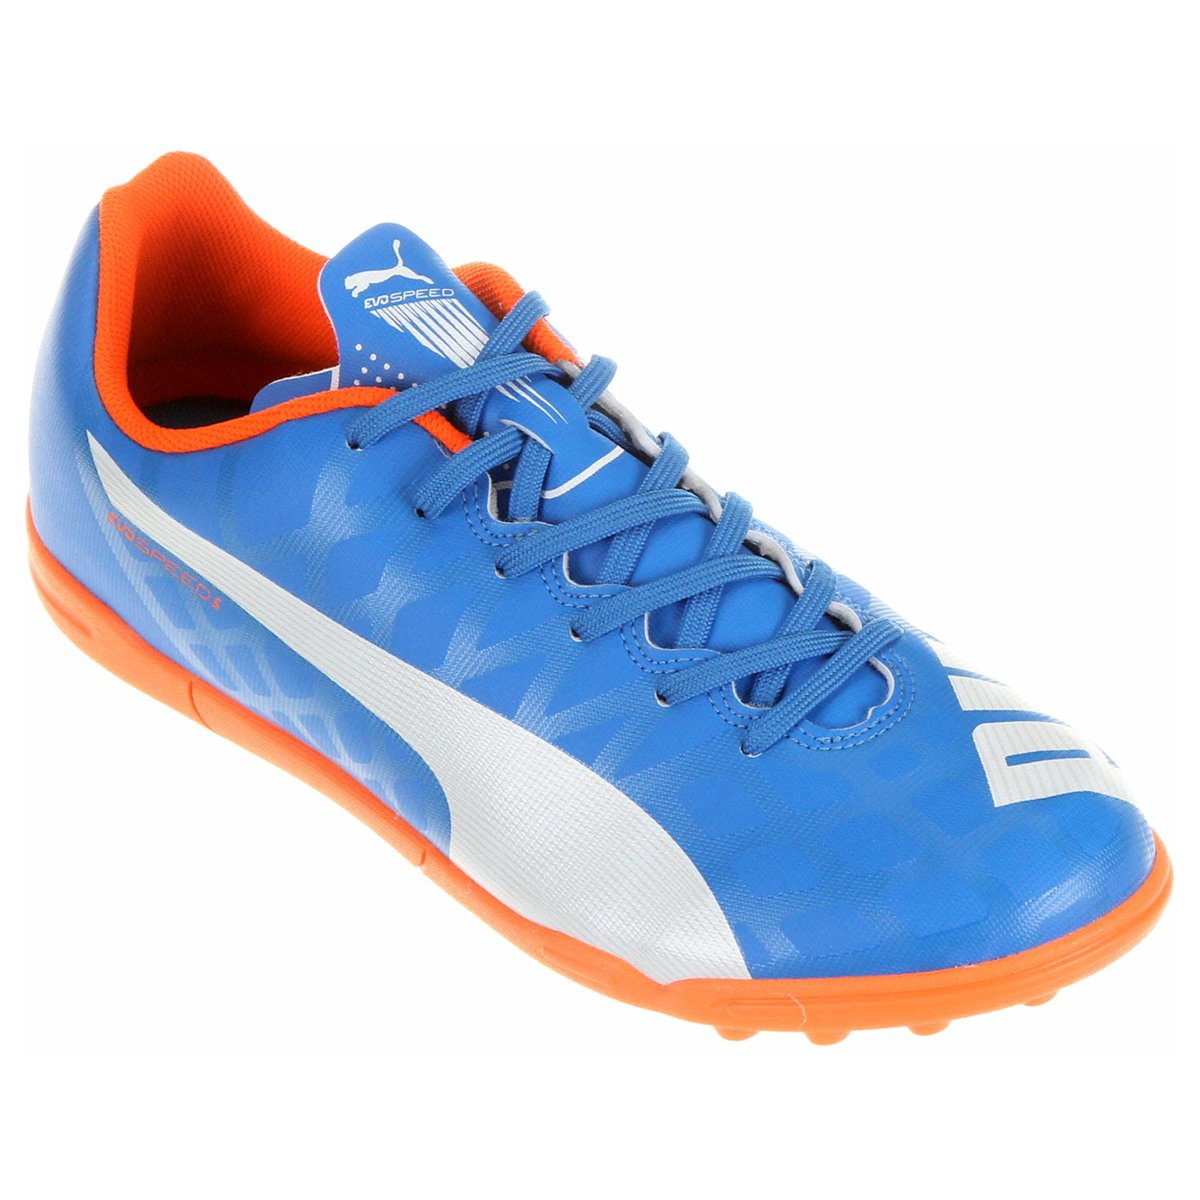 ... aliexpress Chuteira Puma Evospeed 5.4 TT Society - Compre Agora  Netshoes 0df23 b62eb ... 19c55b14b6524